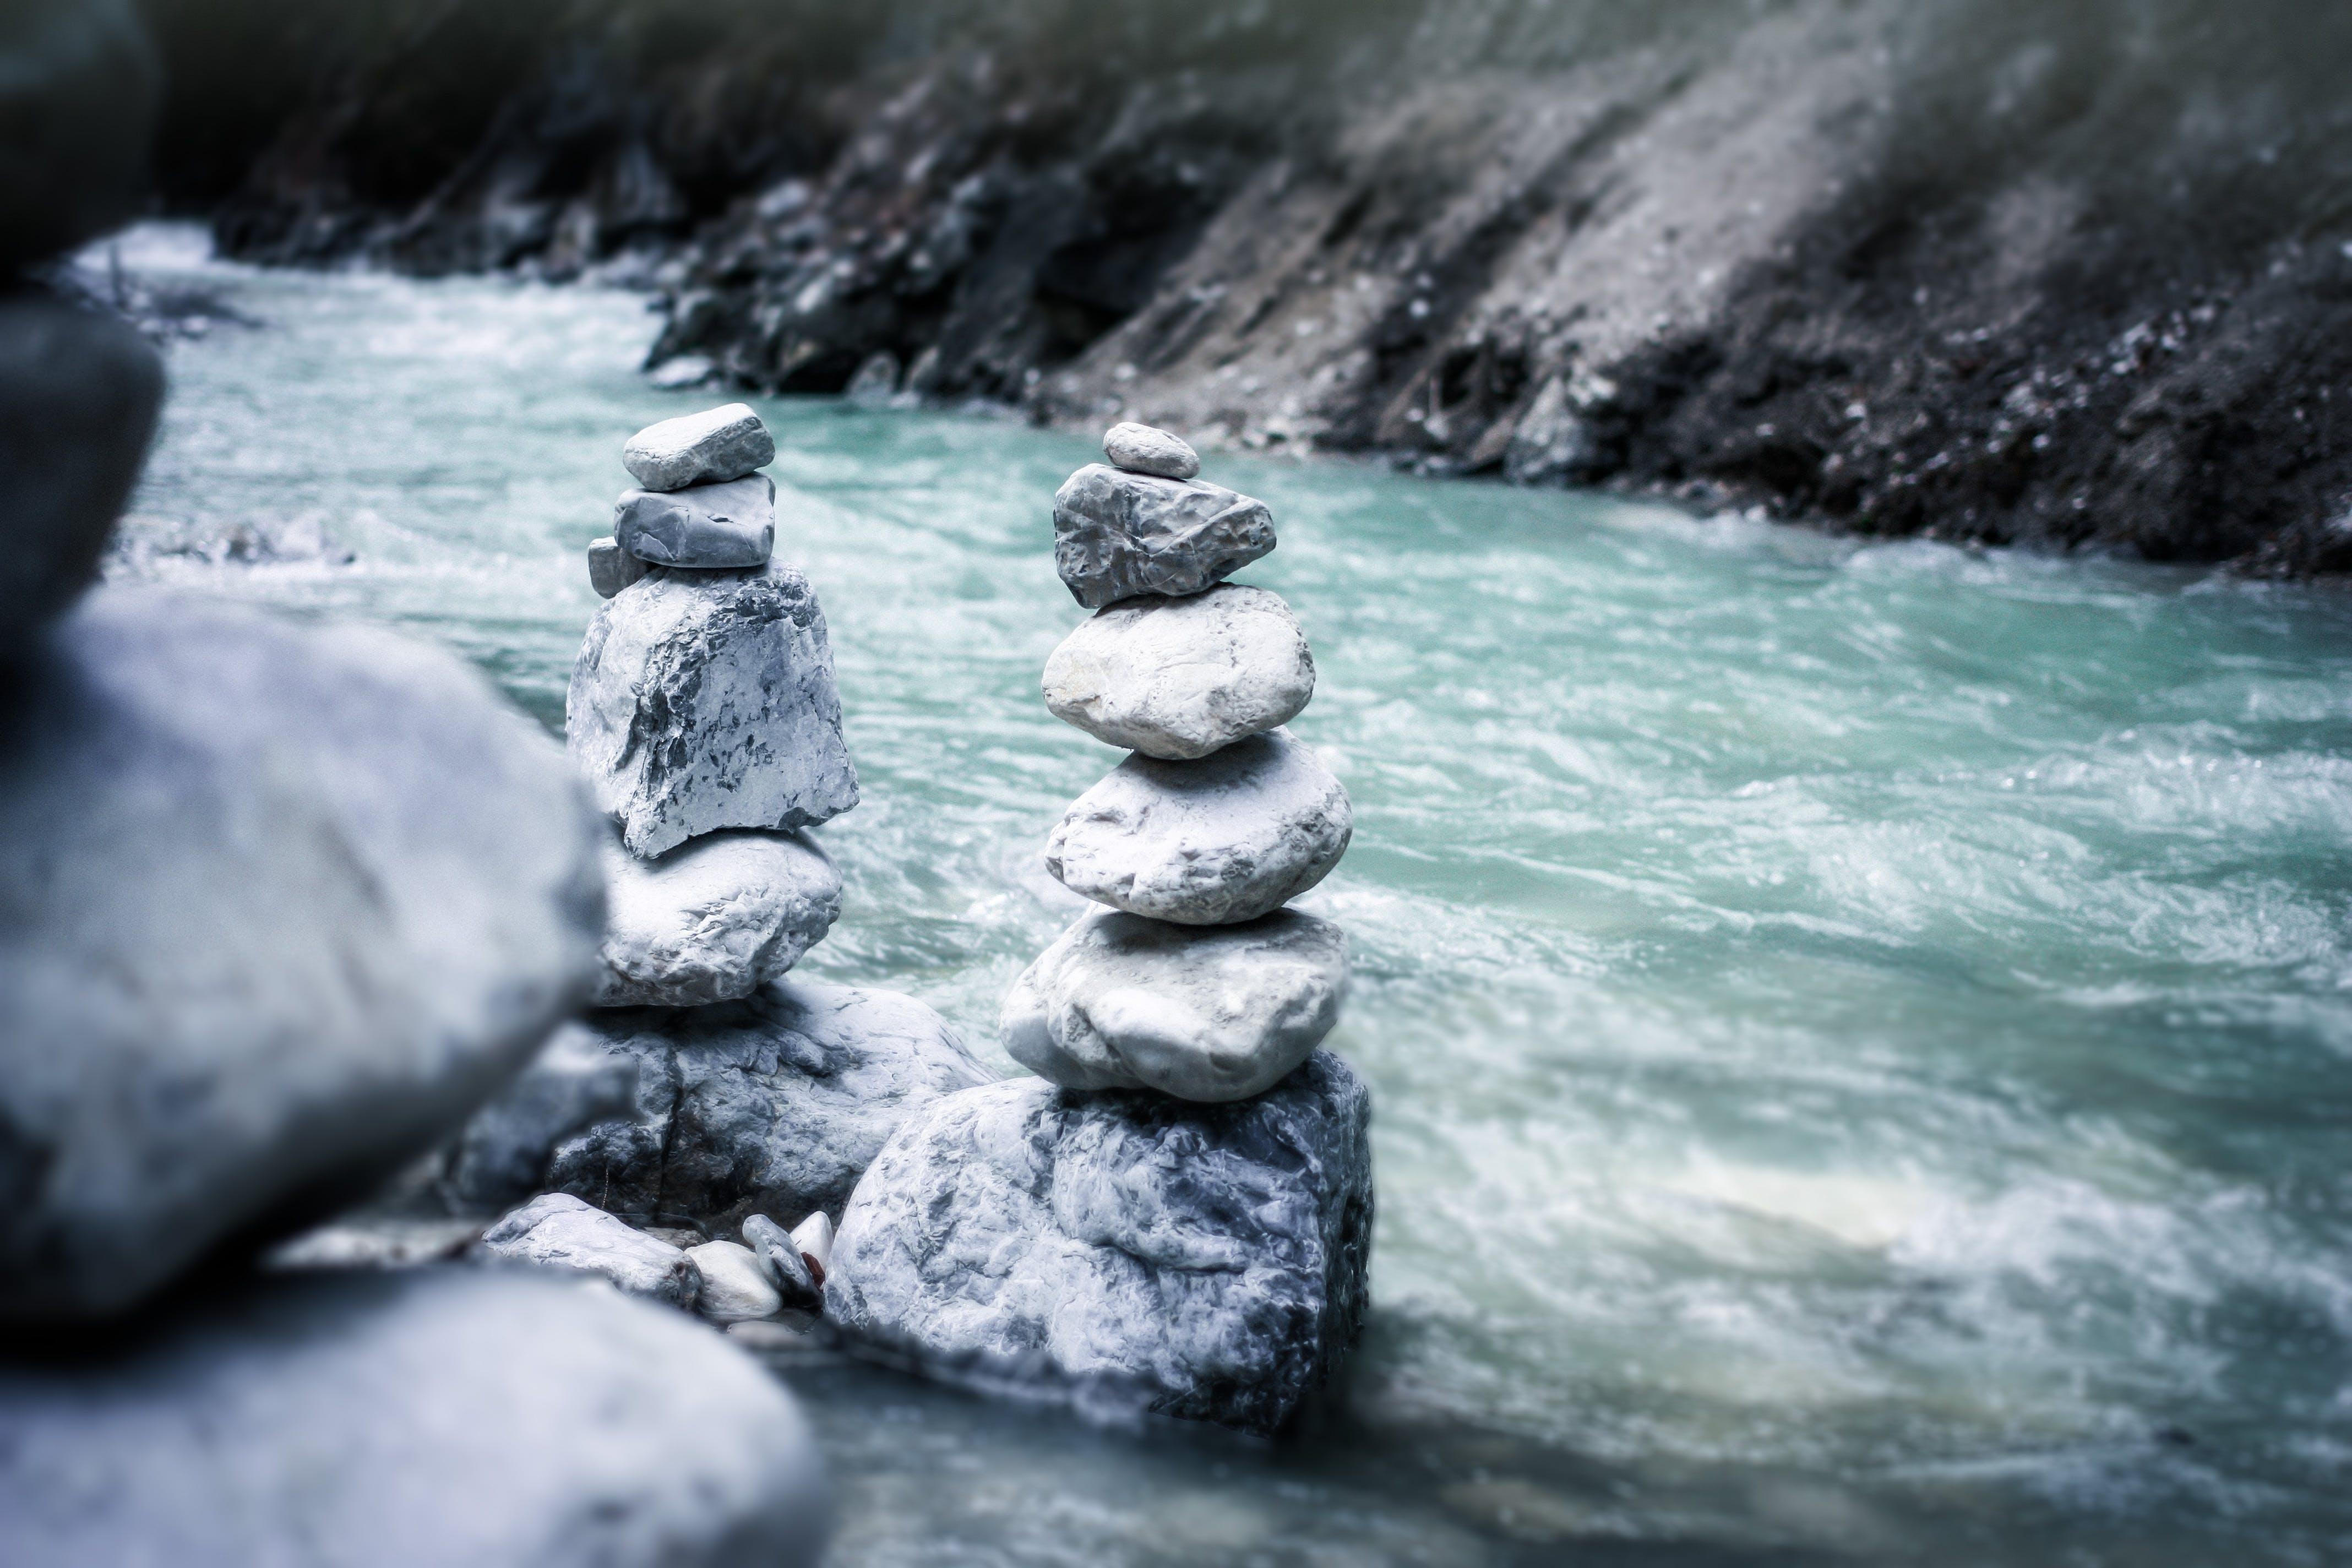 Gray Stock Pile Stone Near River in Gray Scale Photo